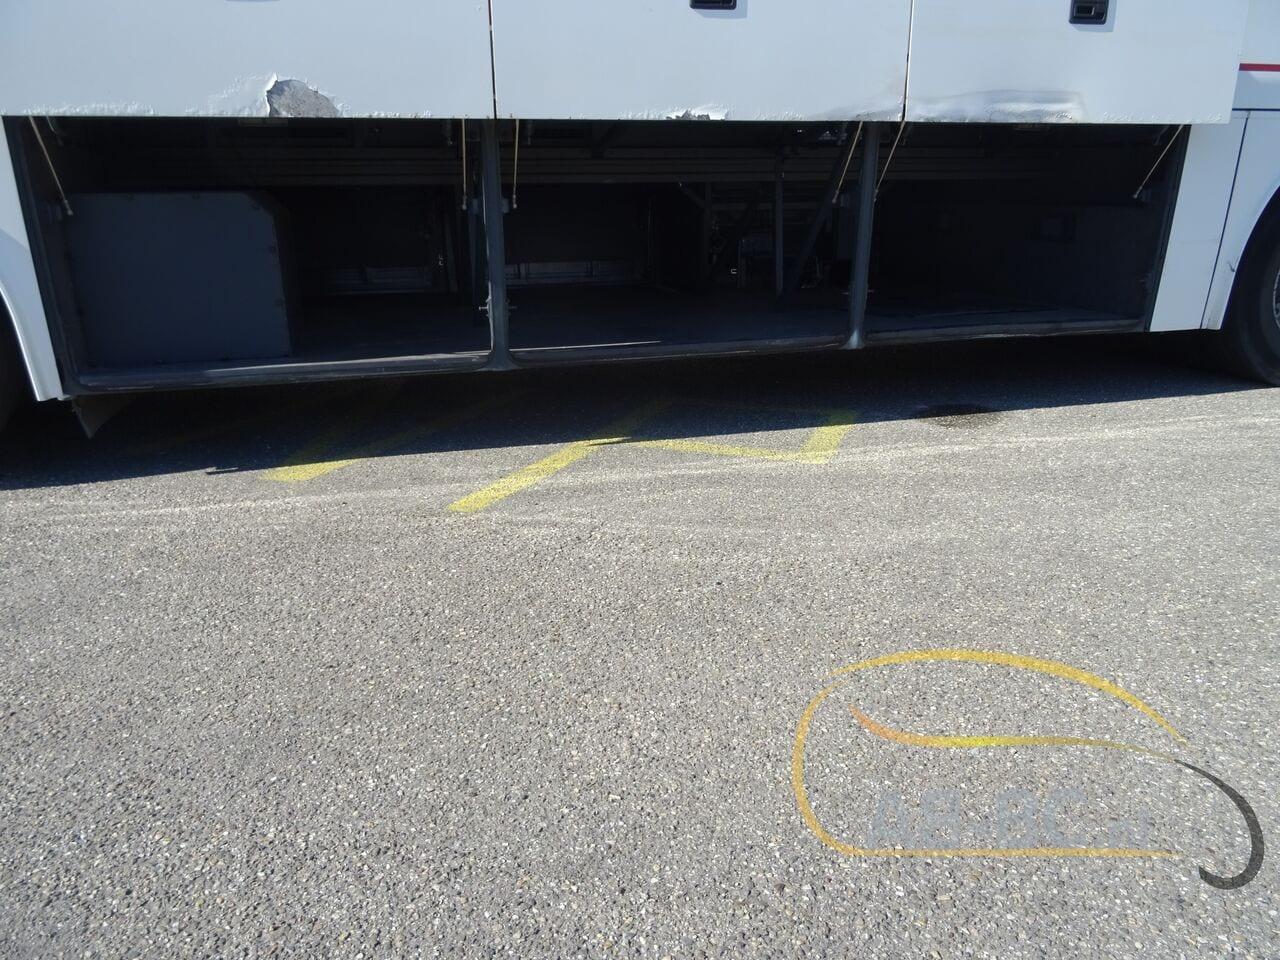 coach-busTEMSA-Safari-RD-53-Seats-DAF-Motor-12-mtr---1616166510532587160_big_f1dcb2df2c3939080eac6e2e049c74c6--21031917053743807500